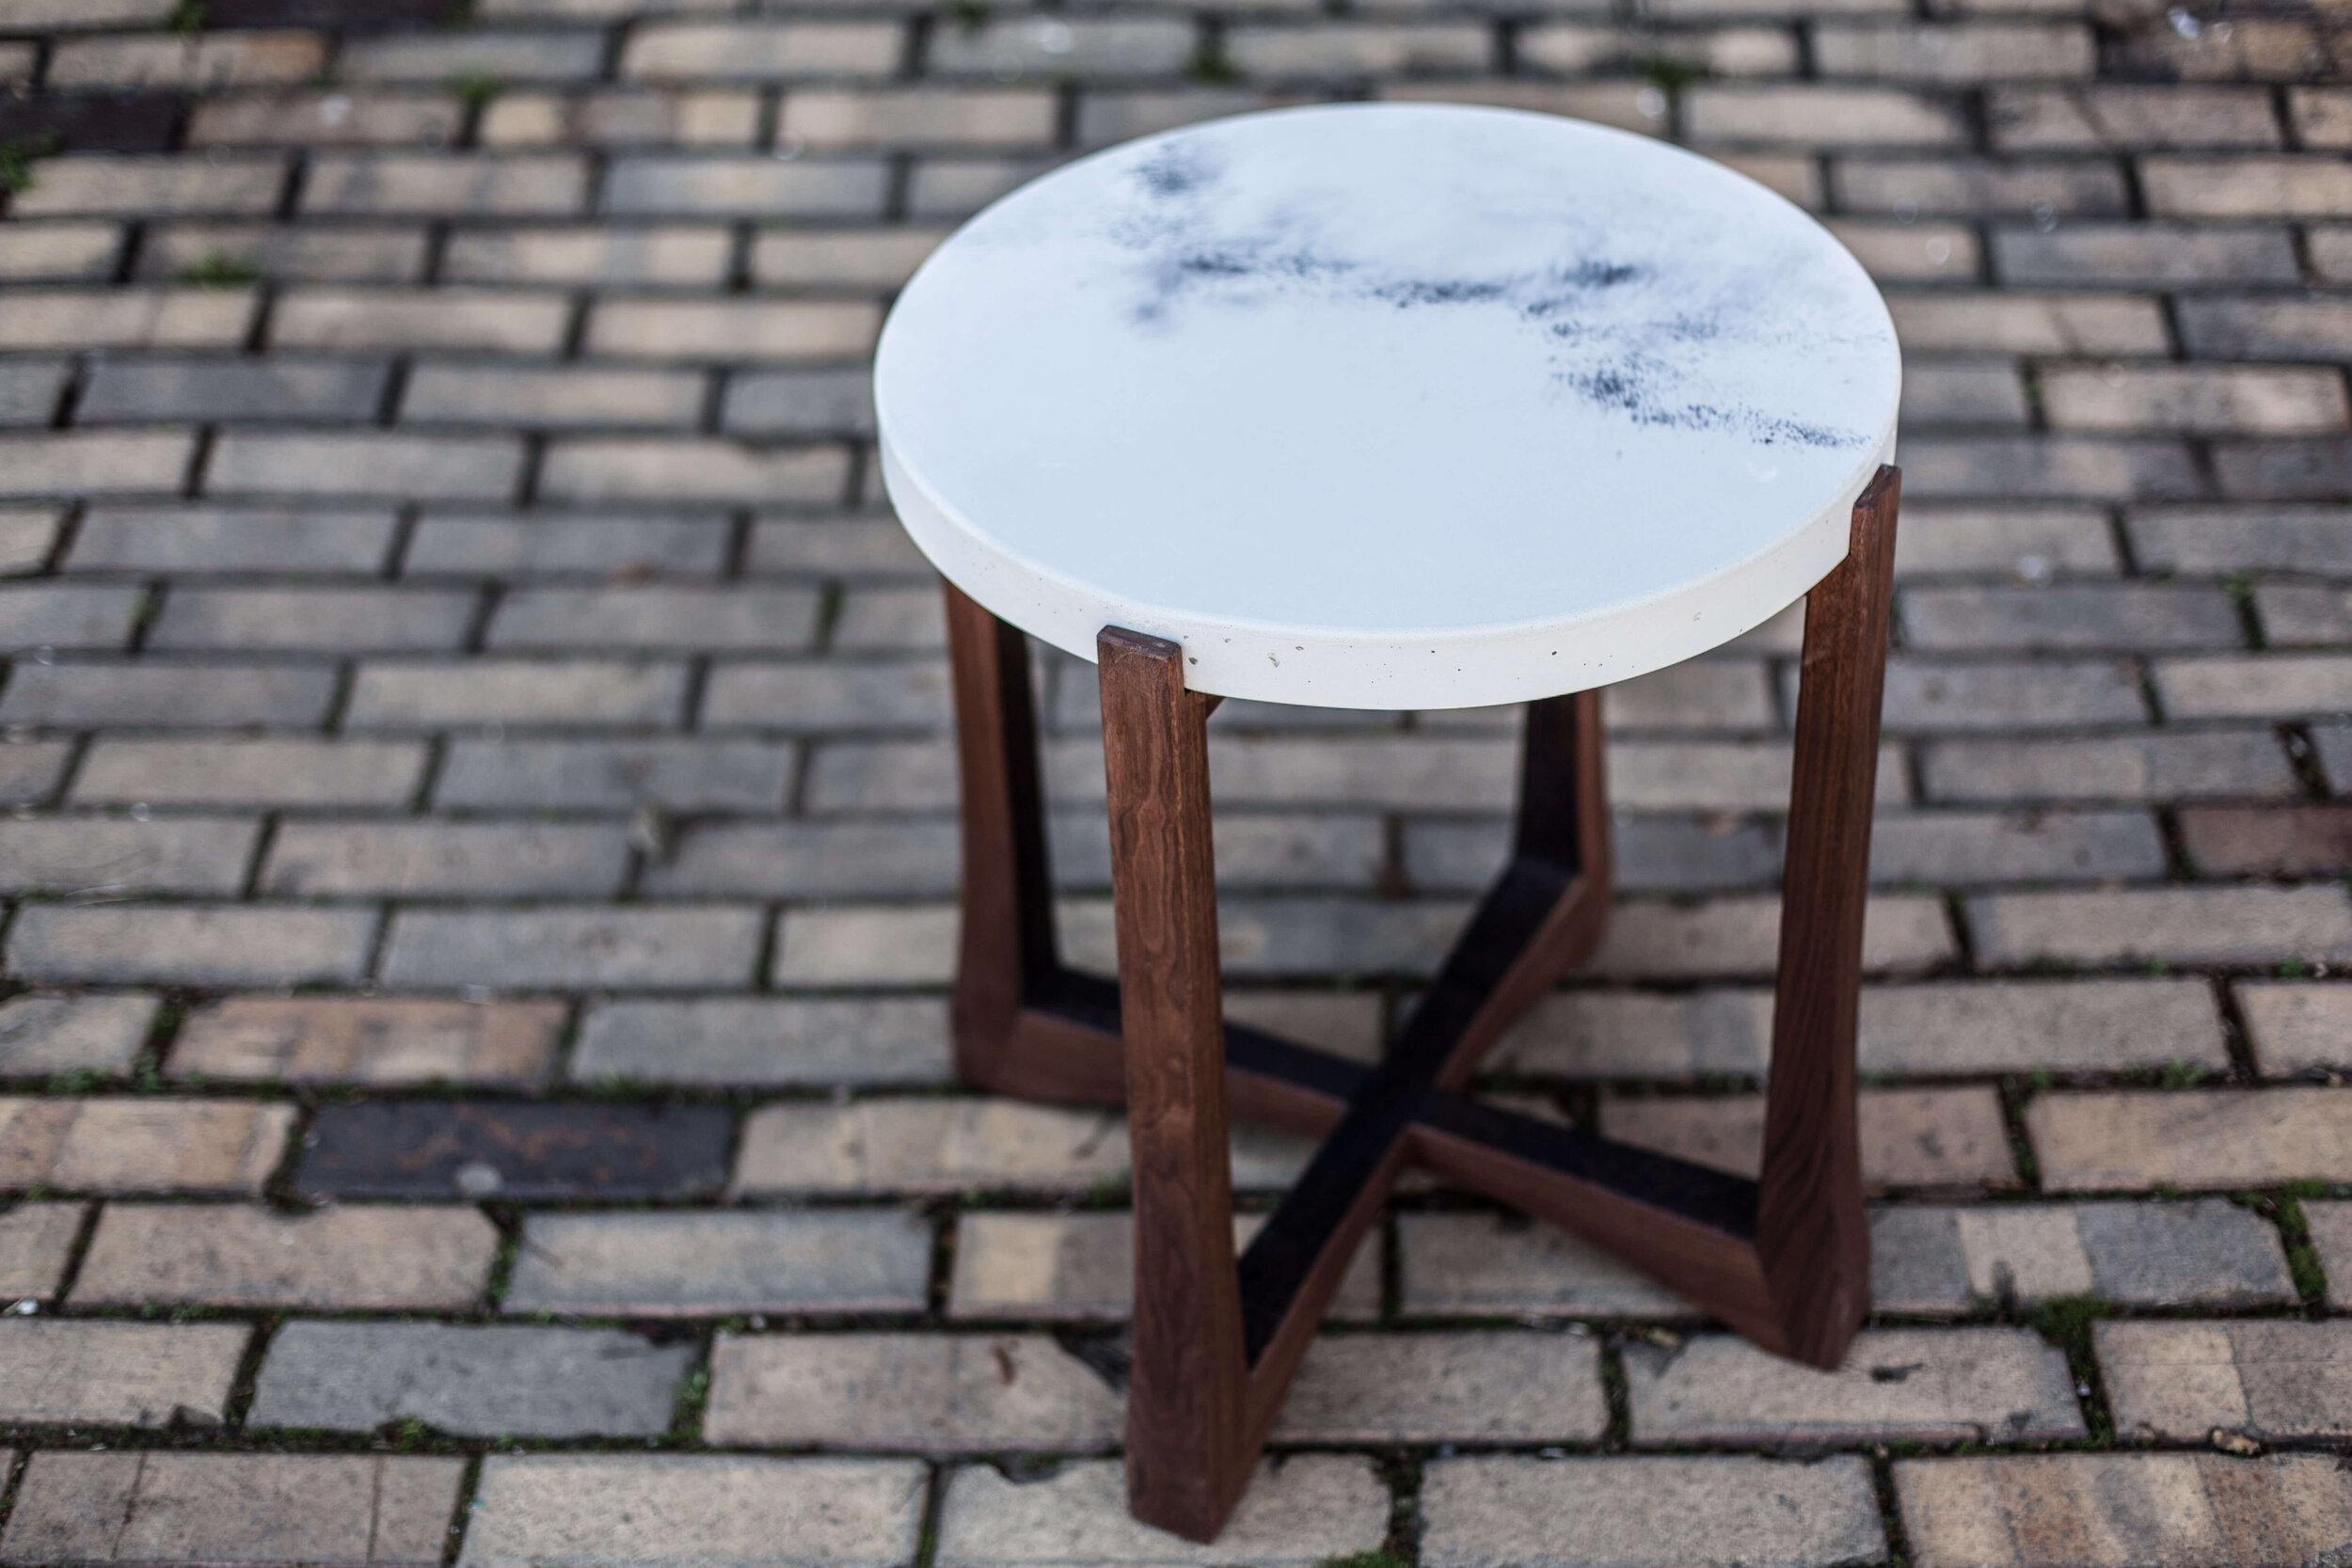 Alicia_Dietz_Modern_Concrete_Furniture_Carved_Wood_End_Table_Sofa_Table_Richmond_VA_7